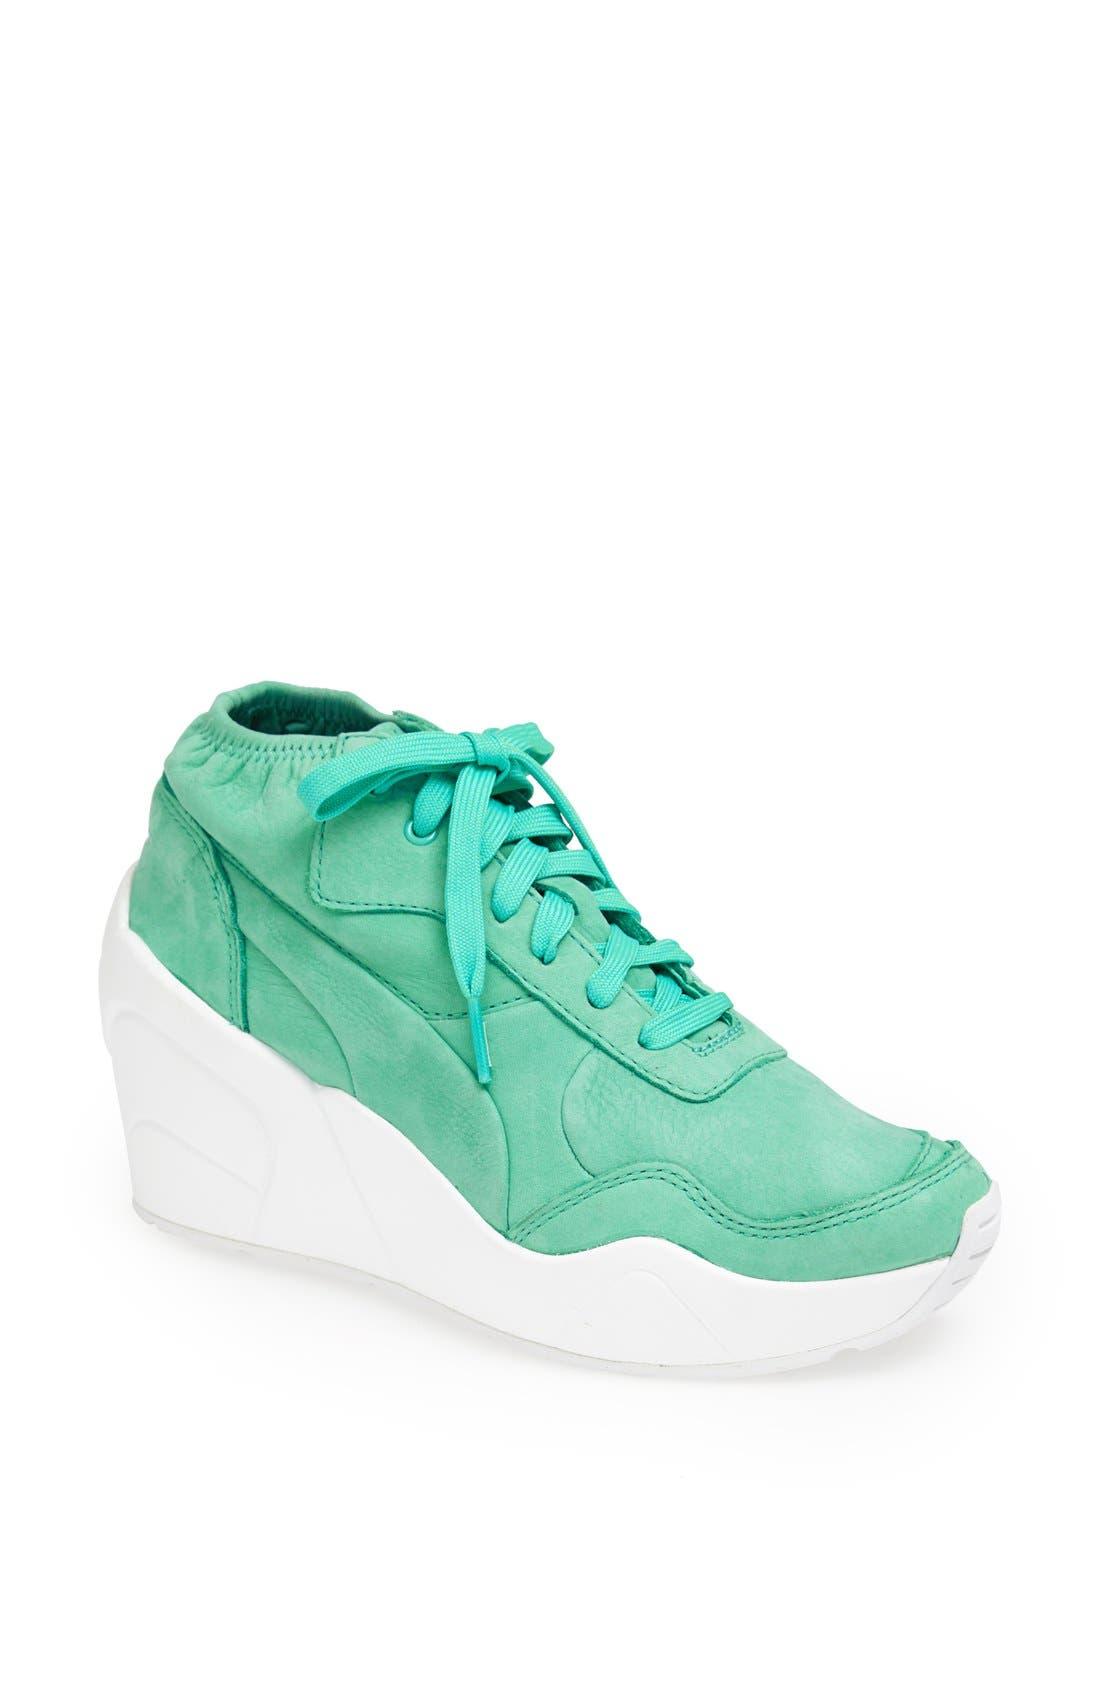 Alternate Image 1 Selected - PUMA 'Trinomic' Wedge Sneaker (Women)